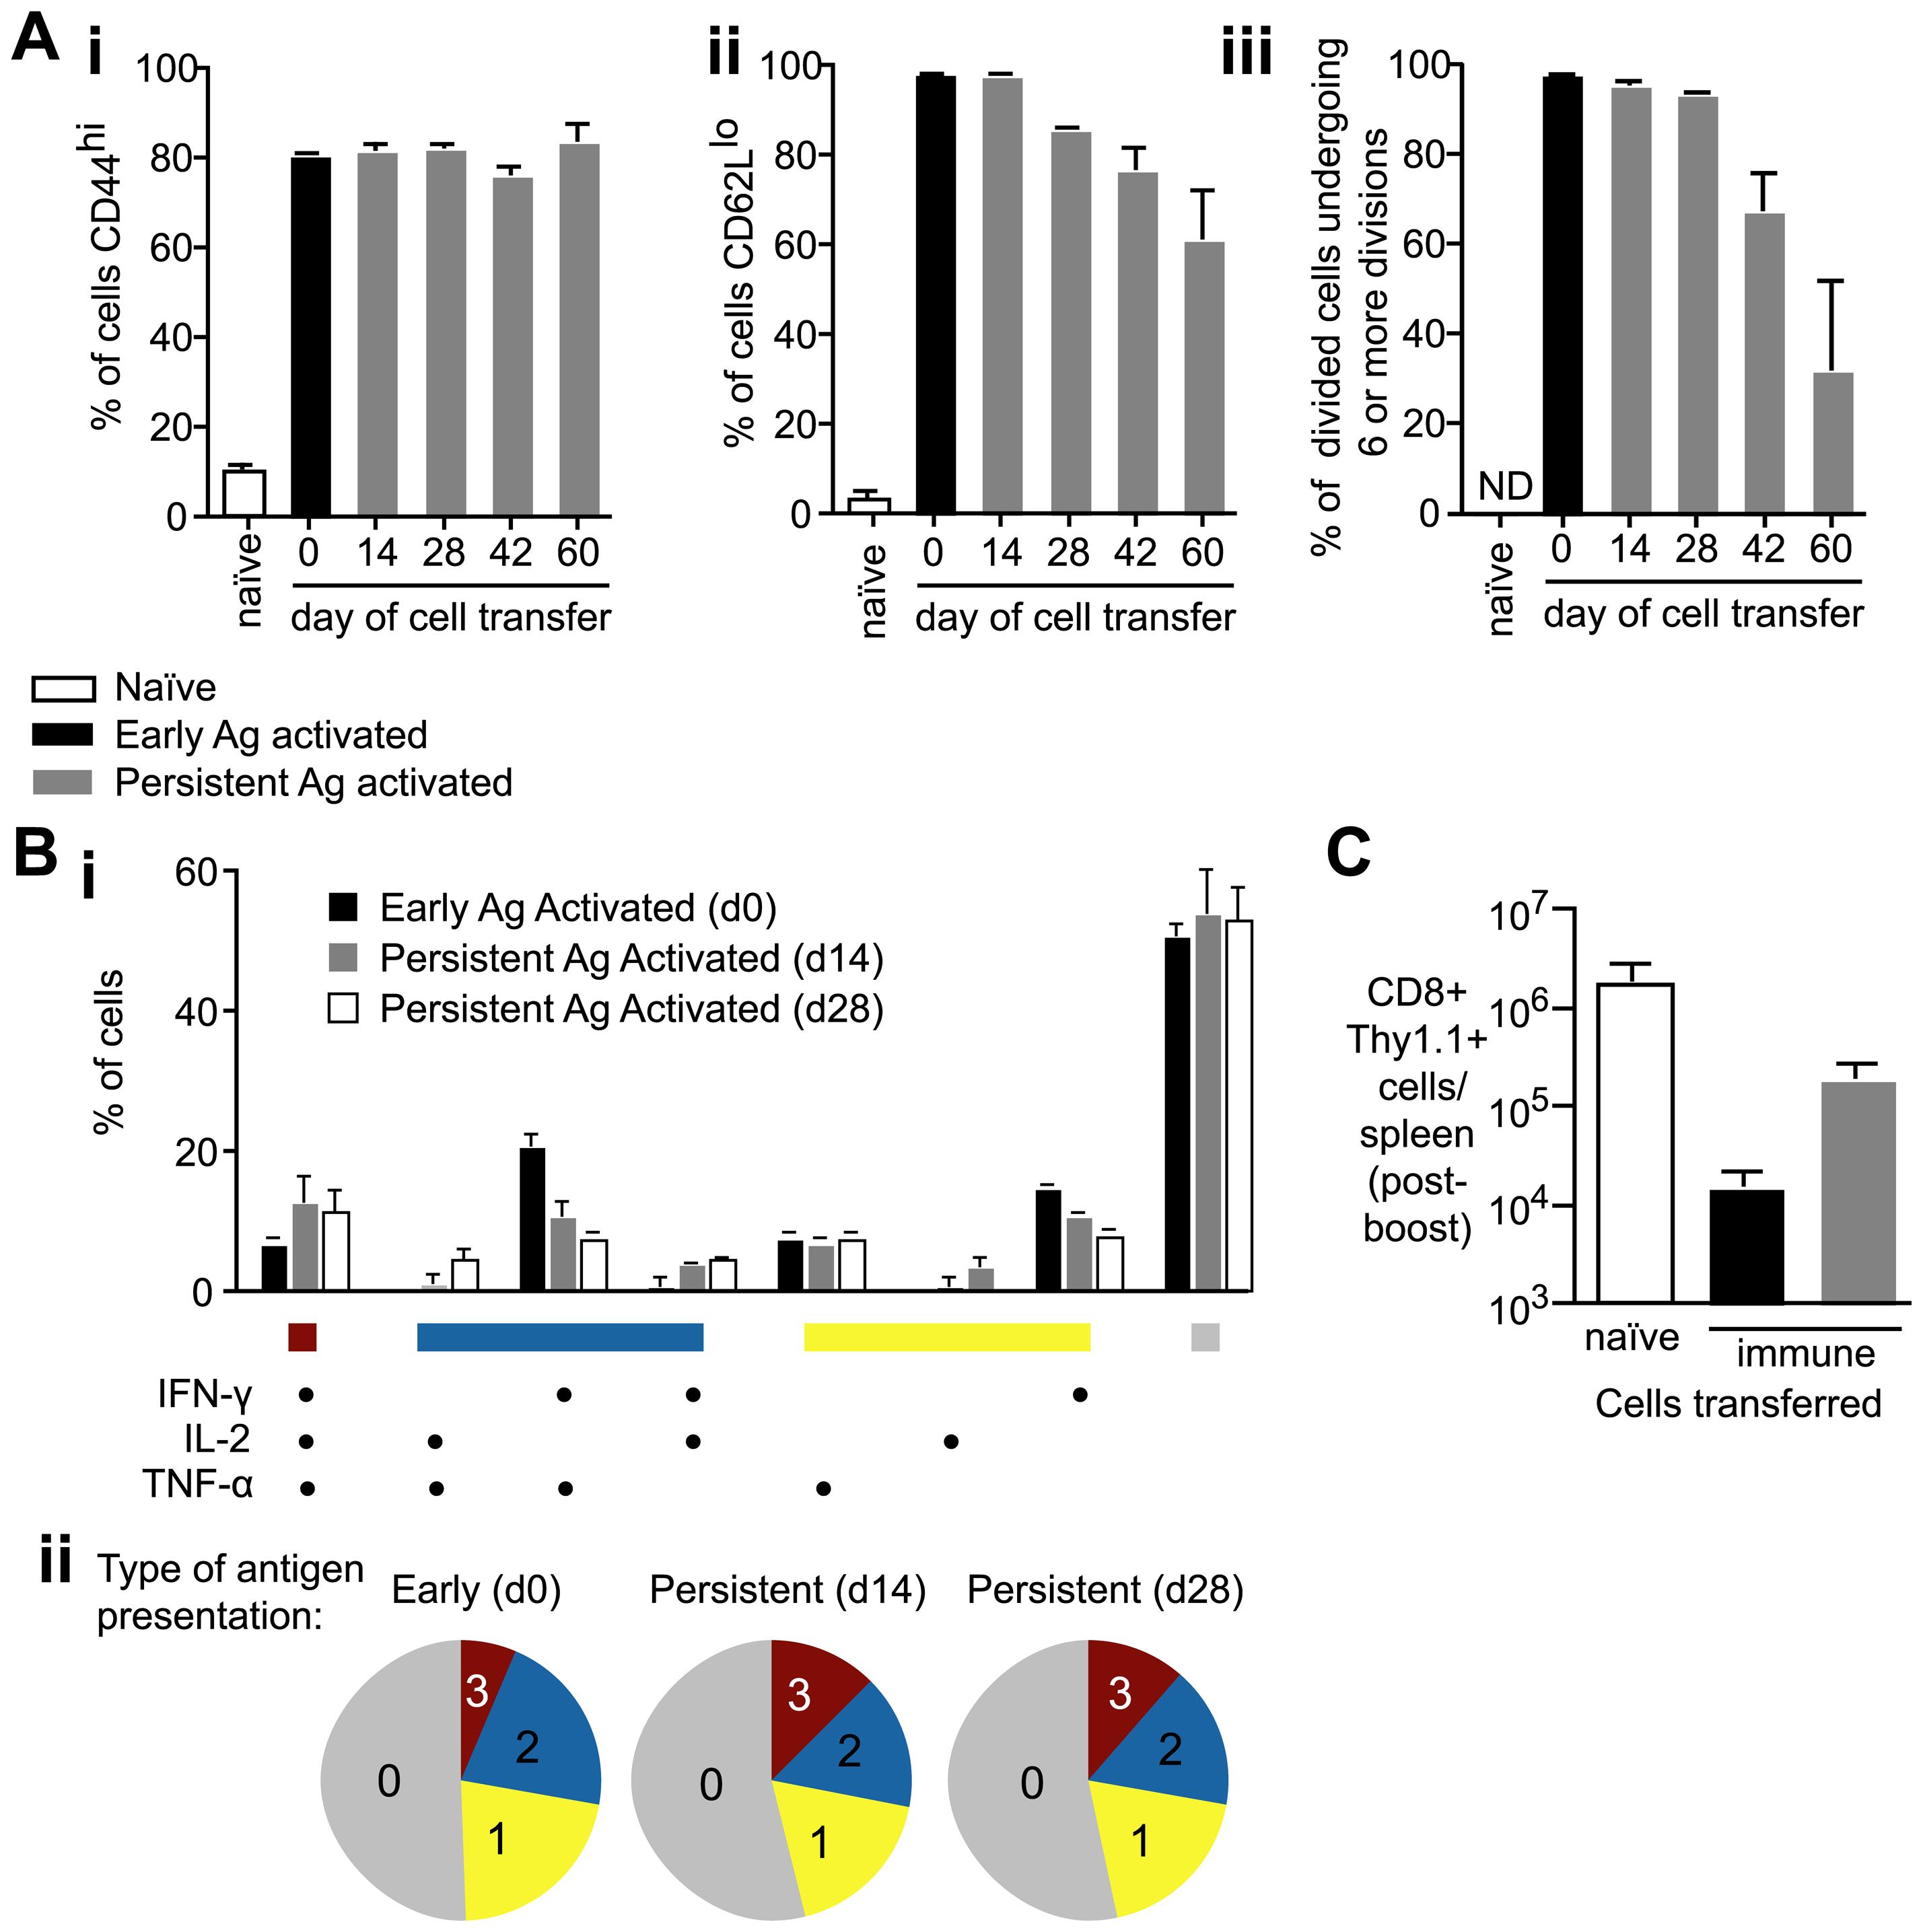 Antigen presentation weeks after immunization can prime T cells to become functional effector cells.